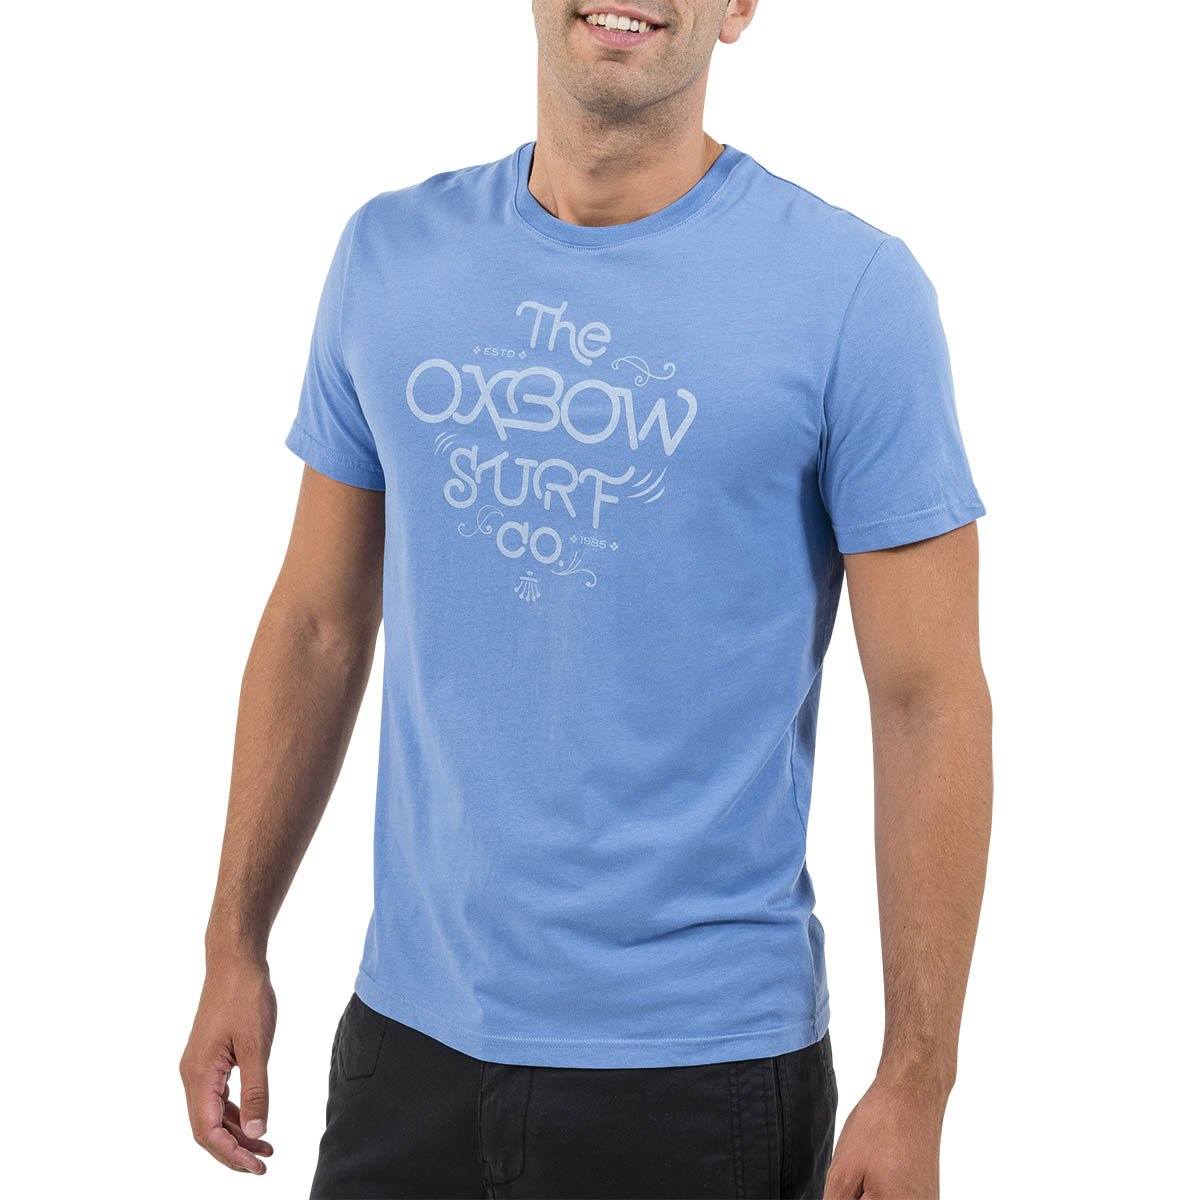 Oxbow oxv048923tee Shirt de Manga Corta para Hombre, Hombre, OXV048923, Azul del Mediterráneo, L Azul del Mediterráneo OXBO3|#Oxbow